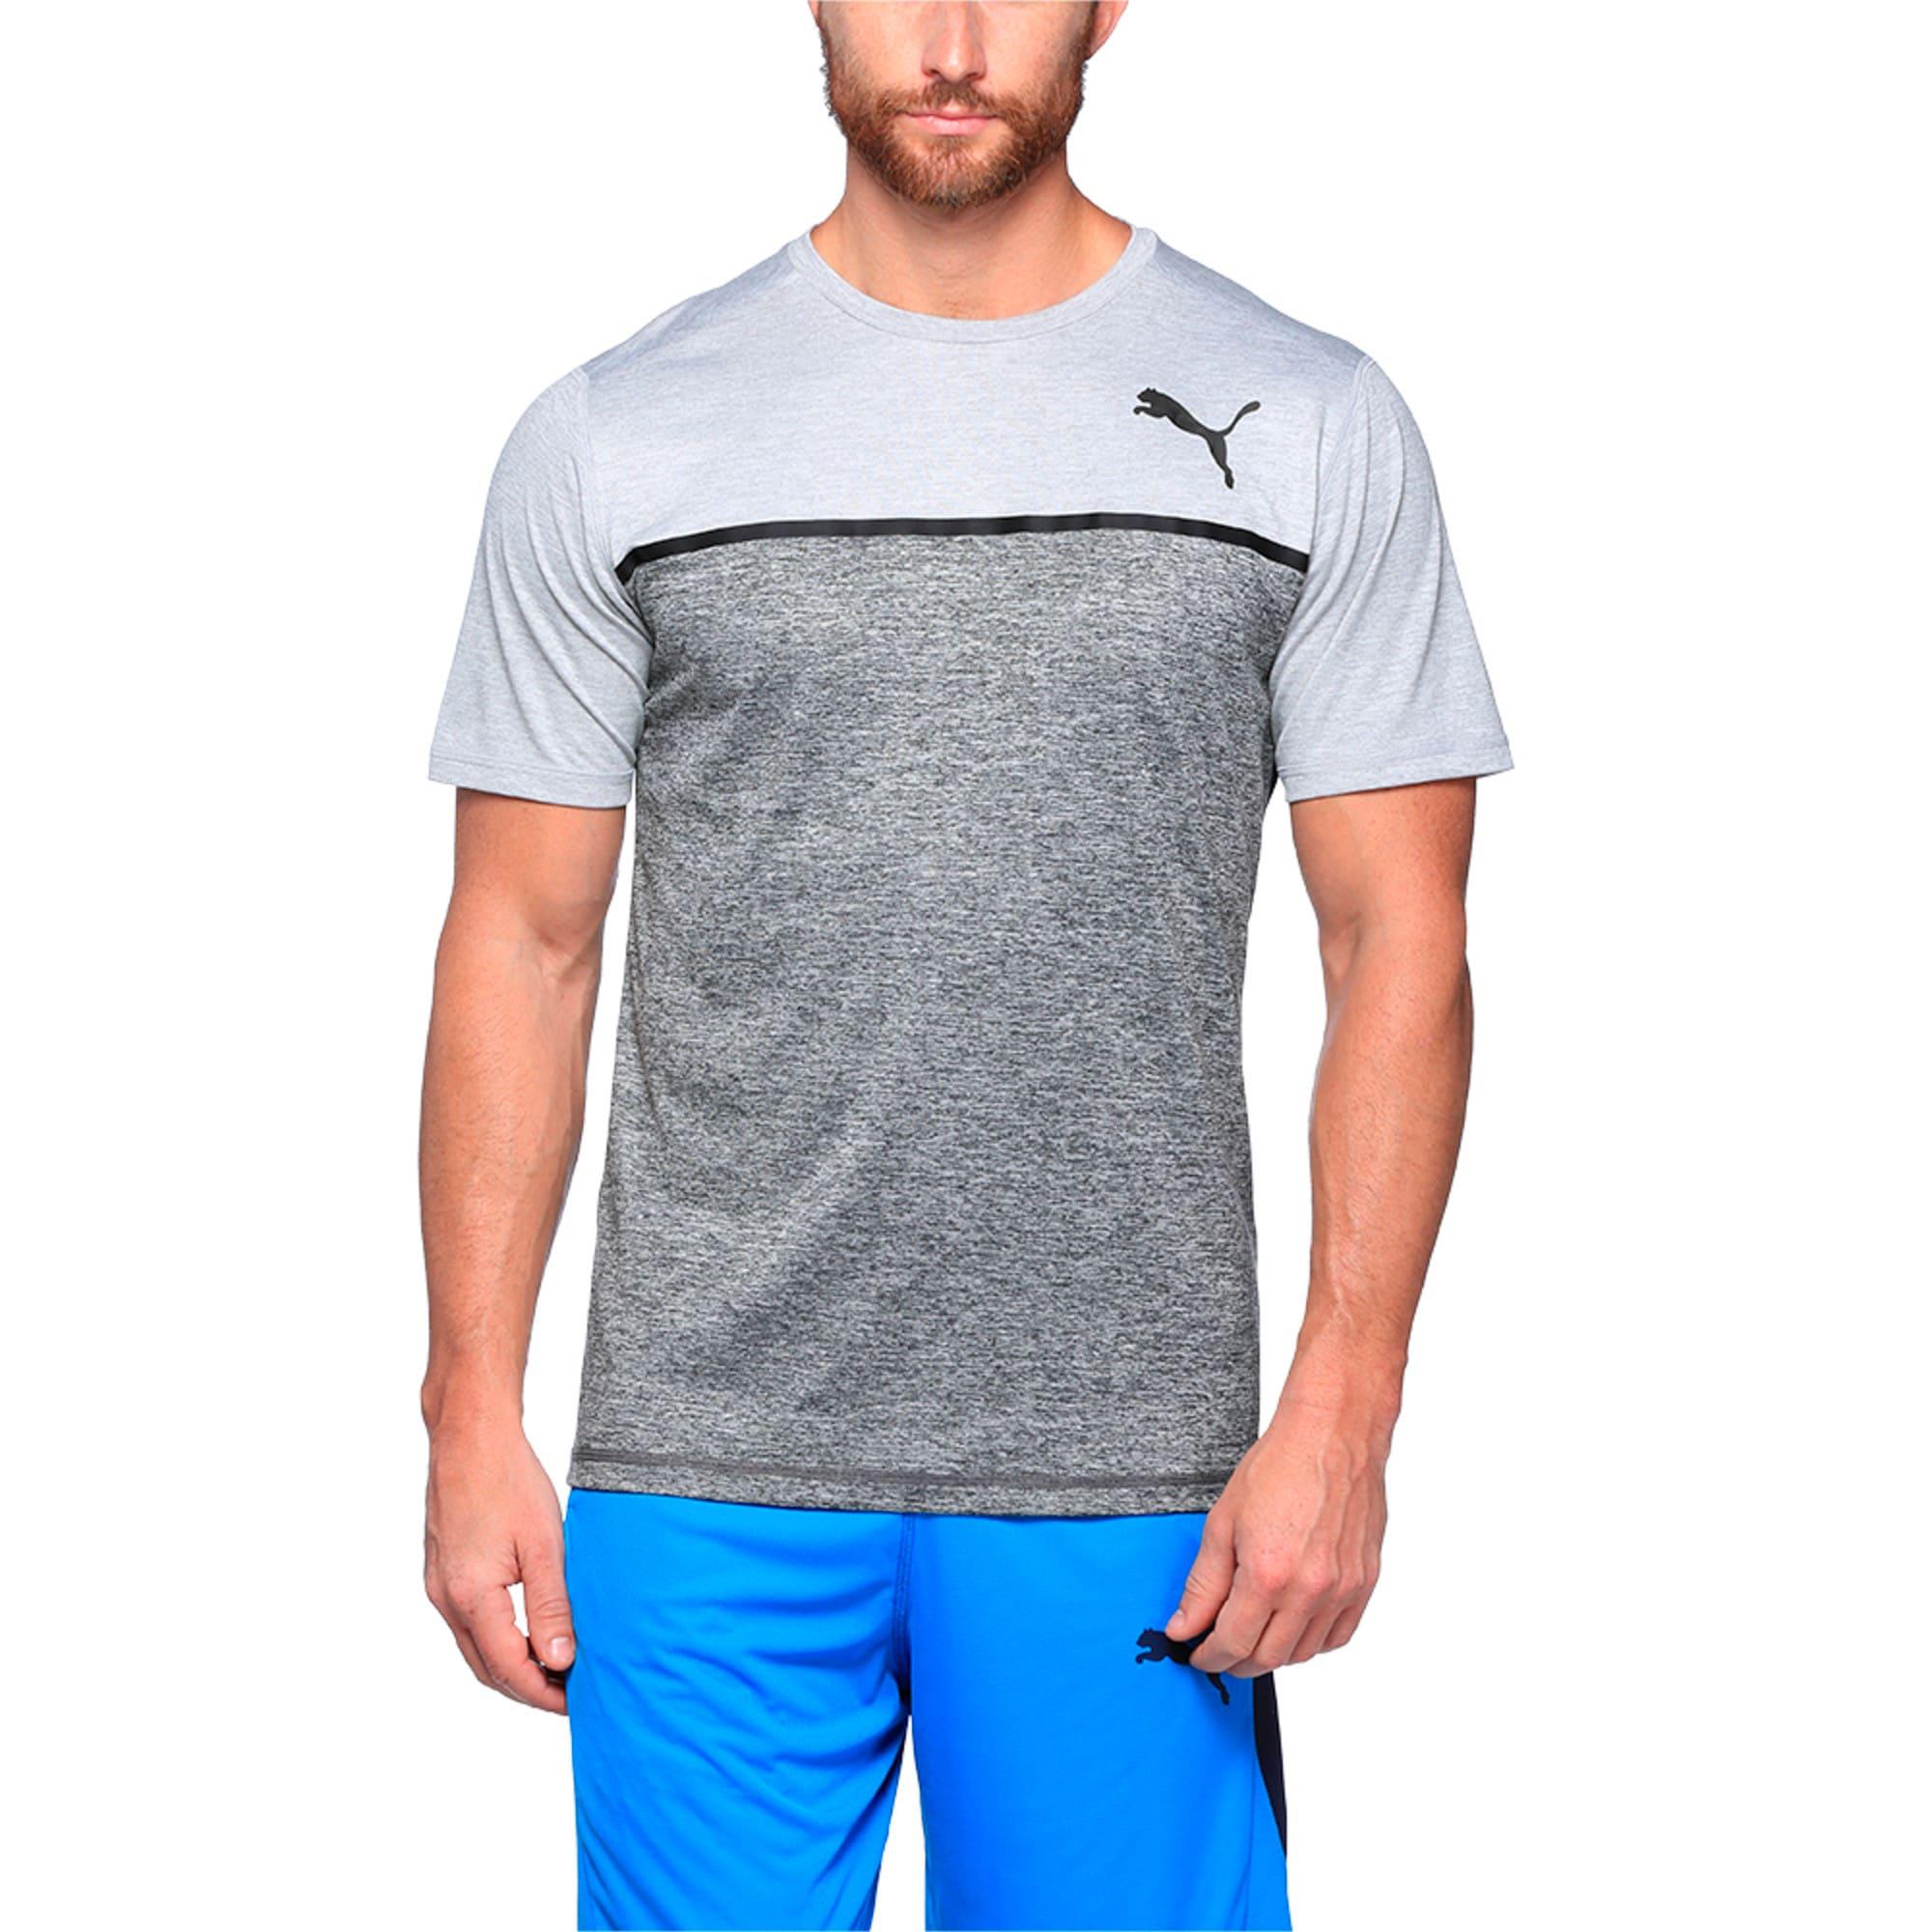 Thumbnail 1 of Active Training Men's Bonded Tech T-Shirt, Light GrayHthr-Dark GrayHthr, medium-IND